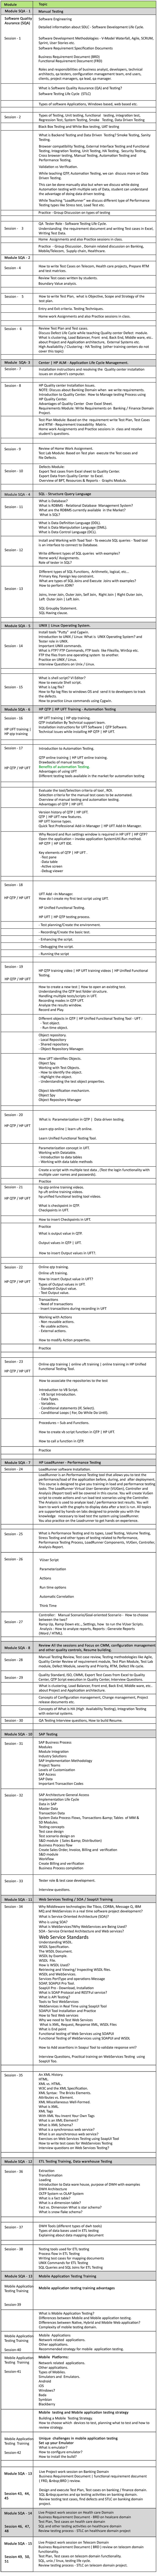 PatsonUSA_QA101_ManualTesting_Training